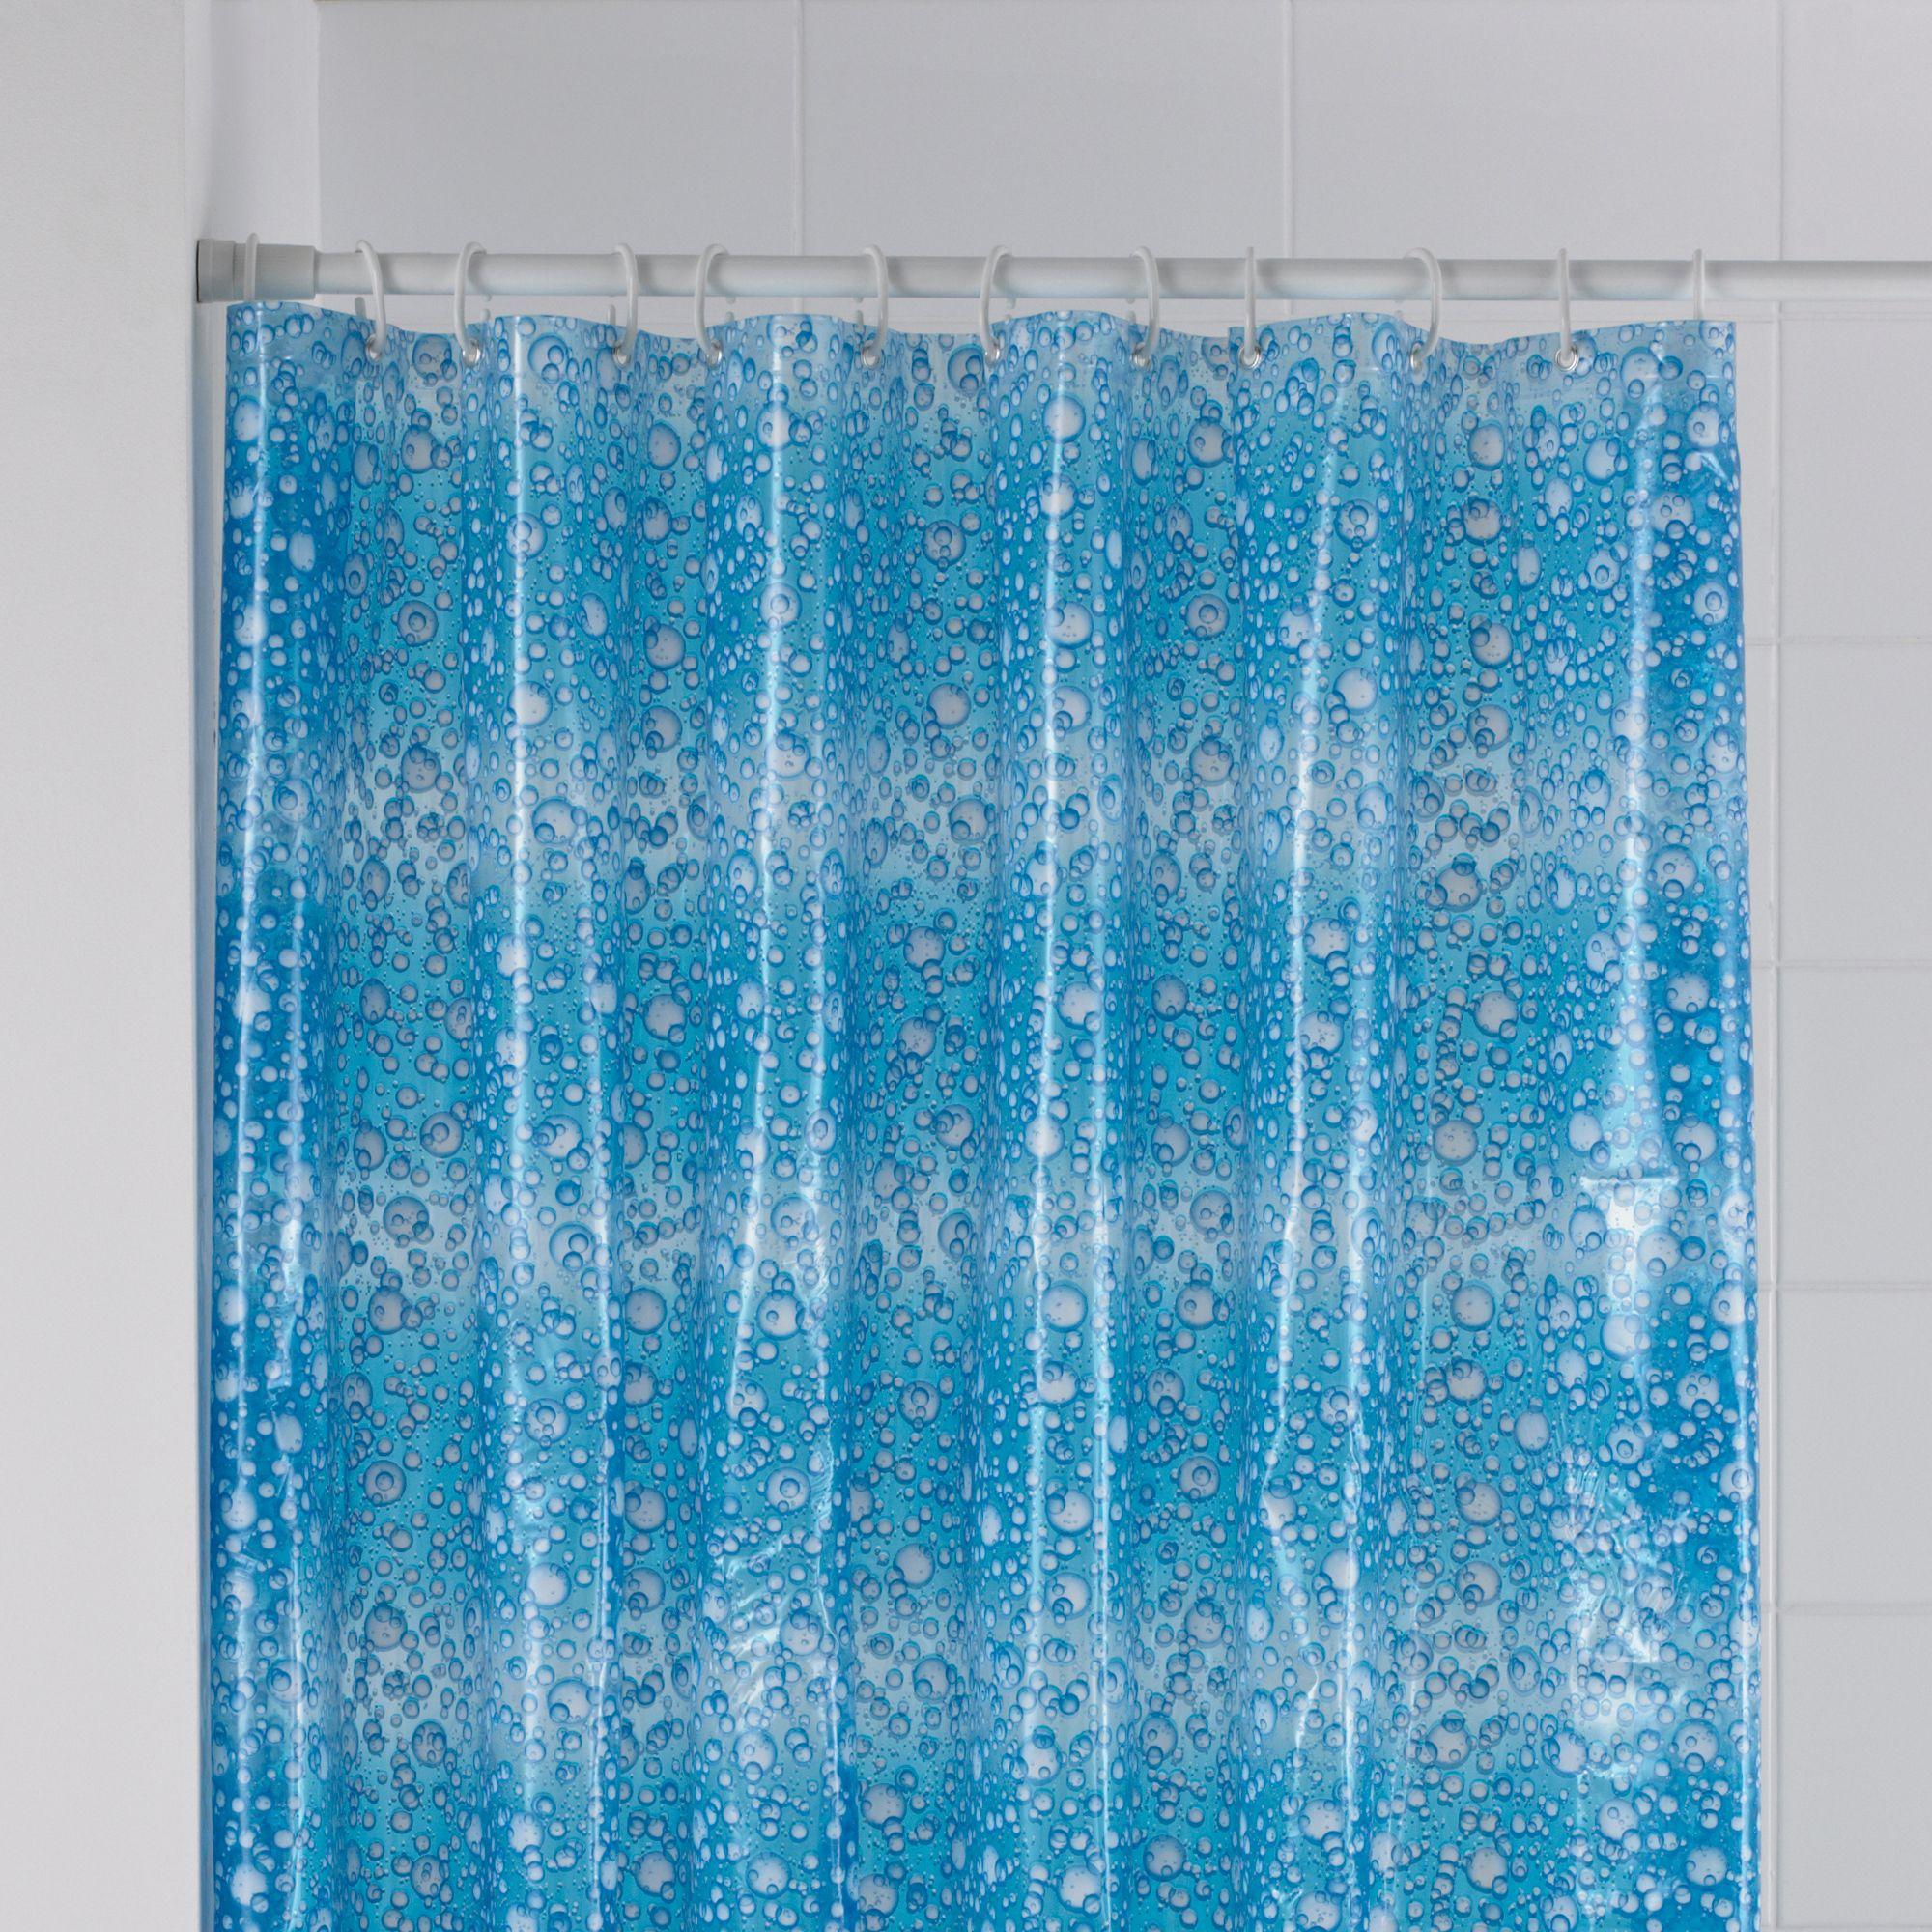 U shaped shower curtain rail b and q - U Shaped Shower Curtain Rail B And Q 29